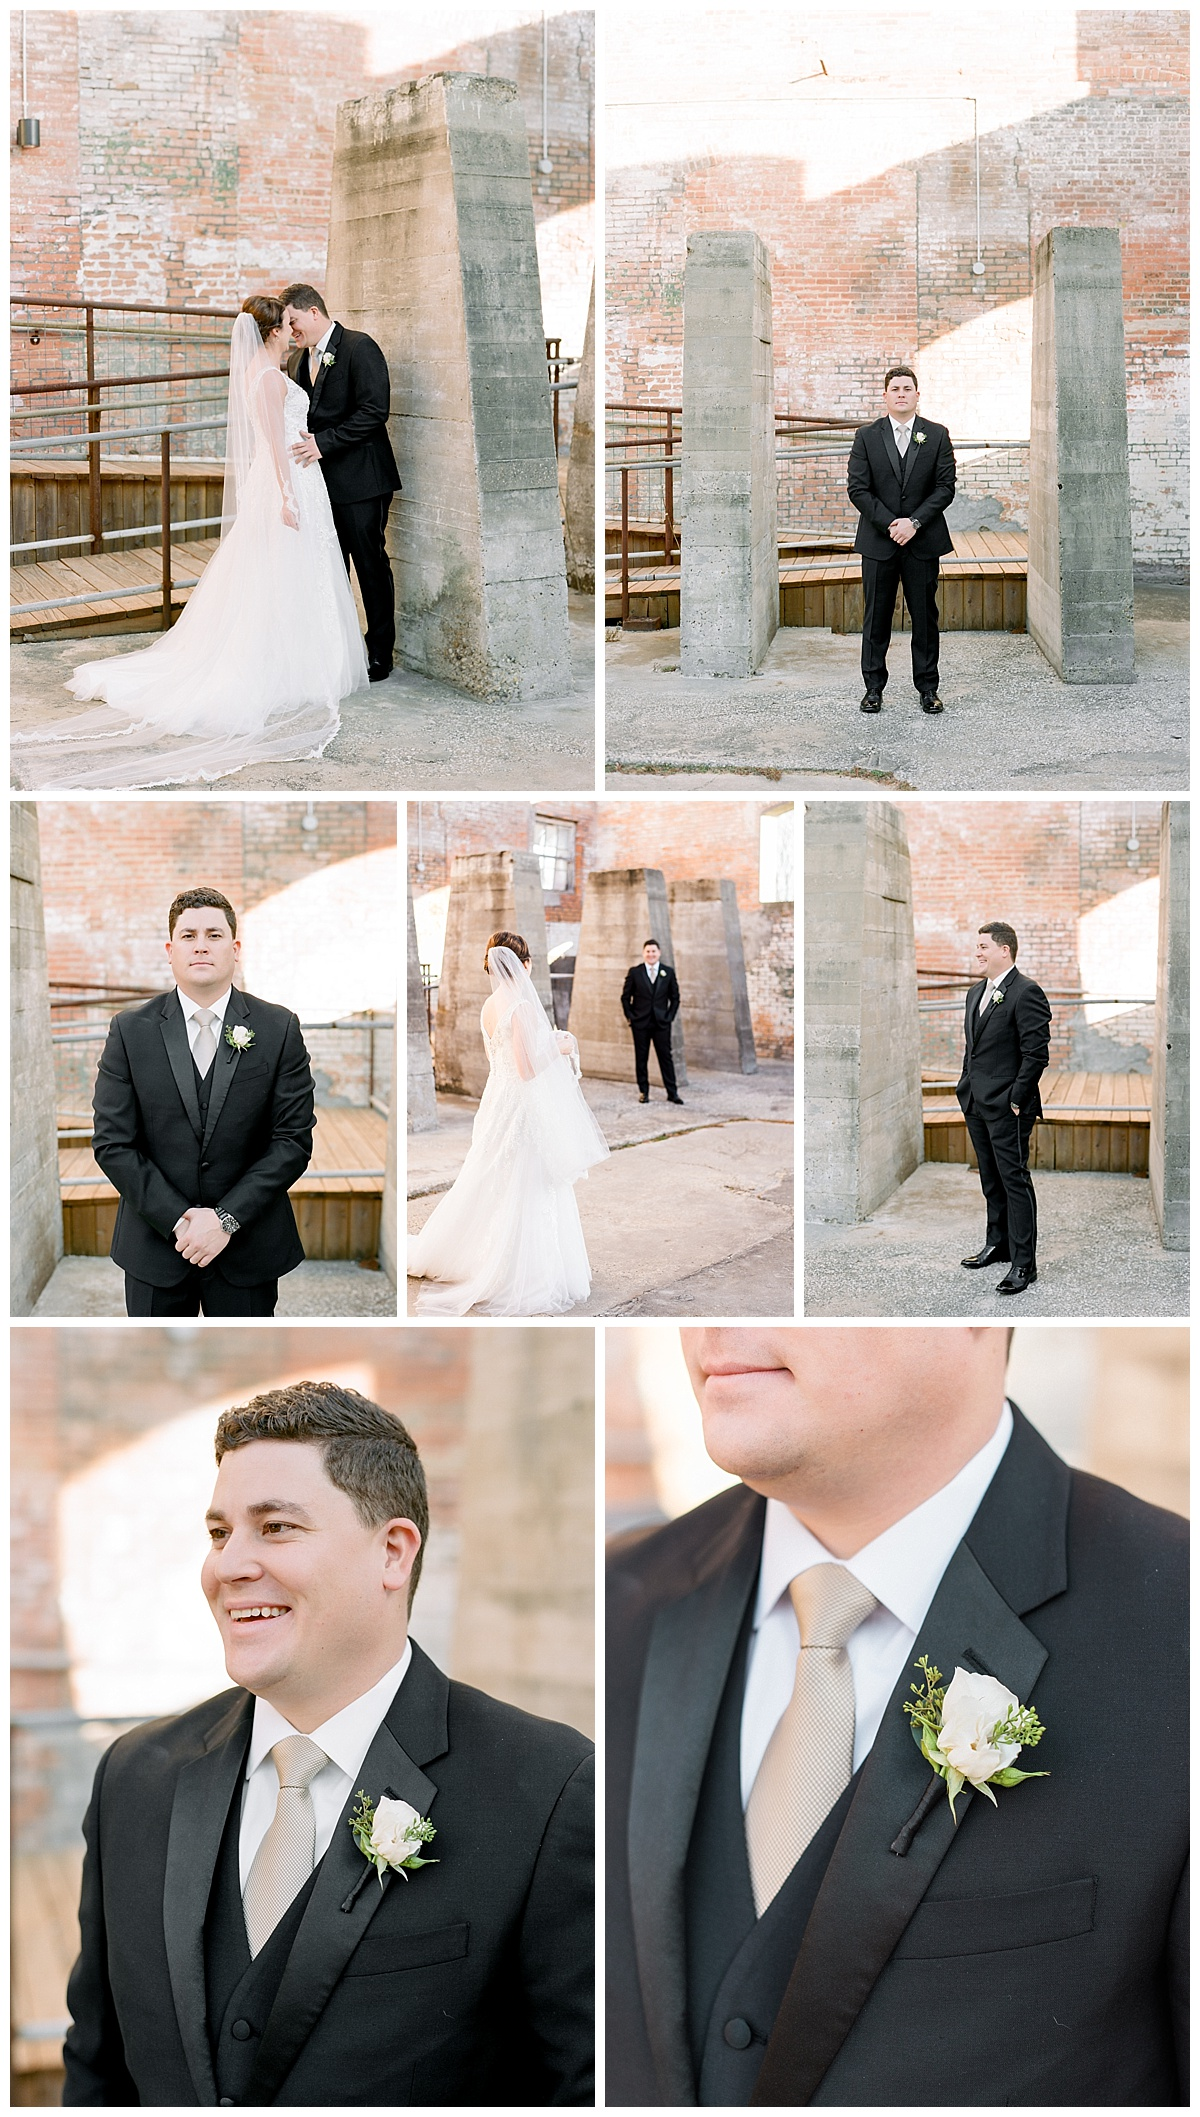 the-cotton-mill-wedding-ar-photography-9.jpg